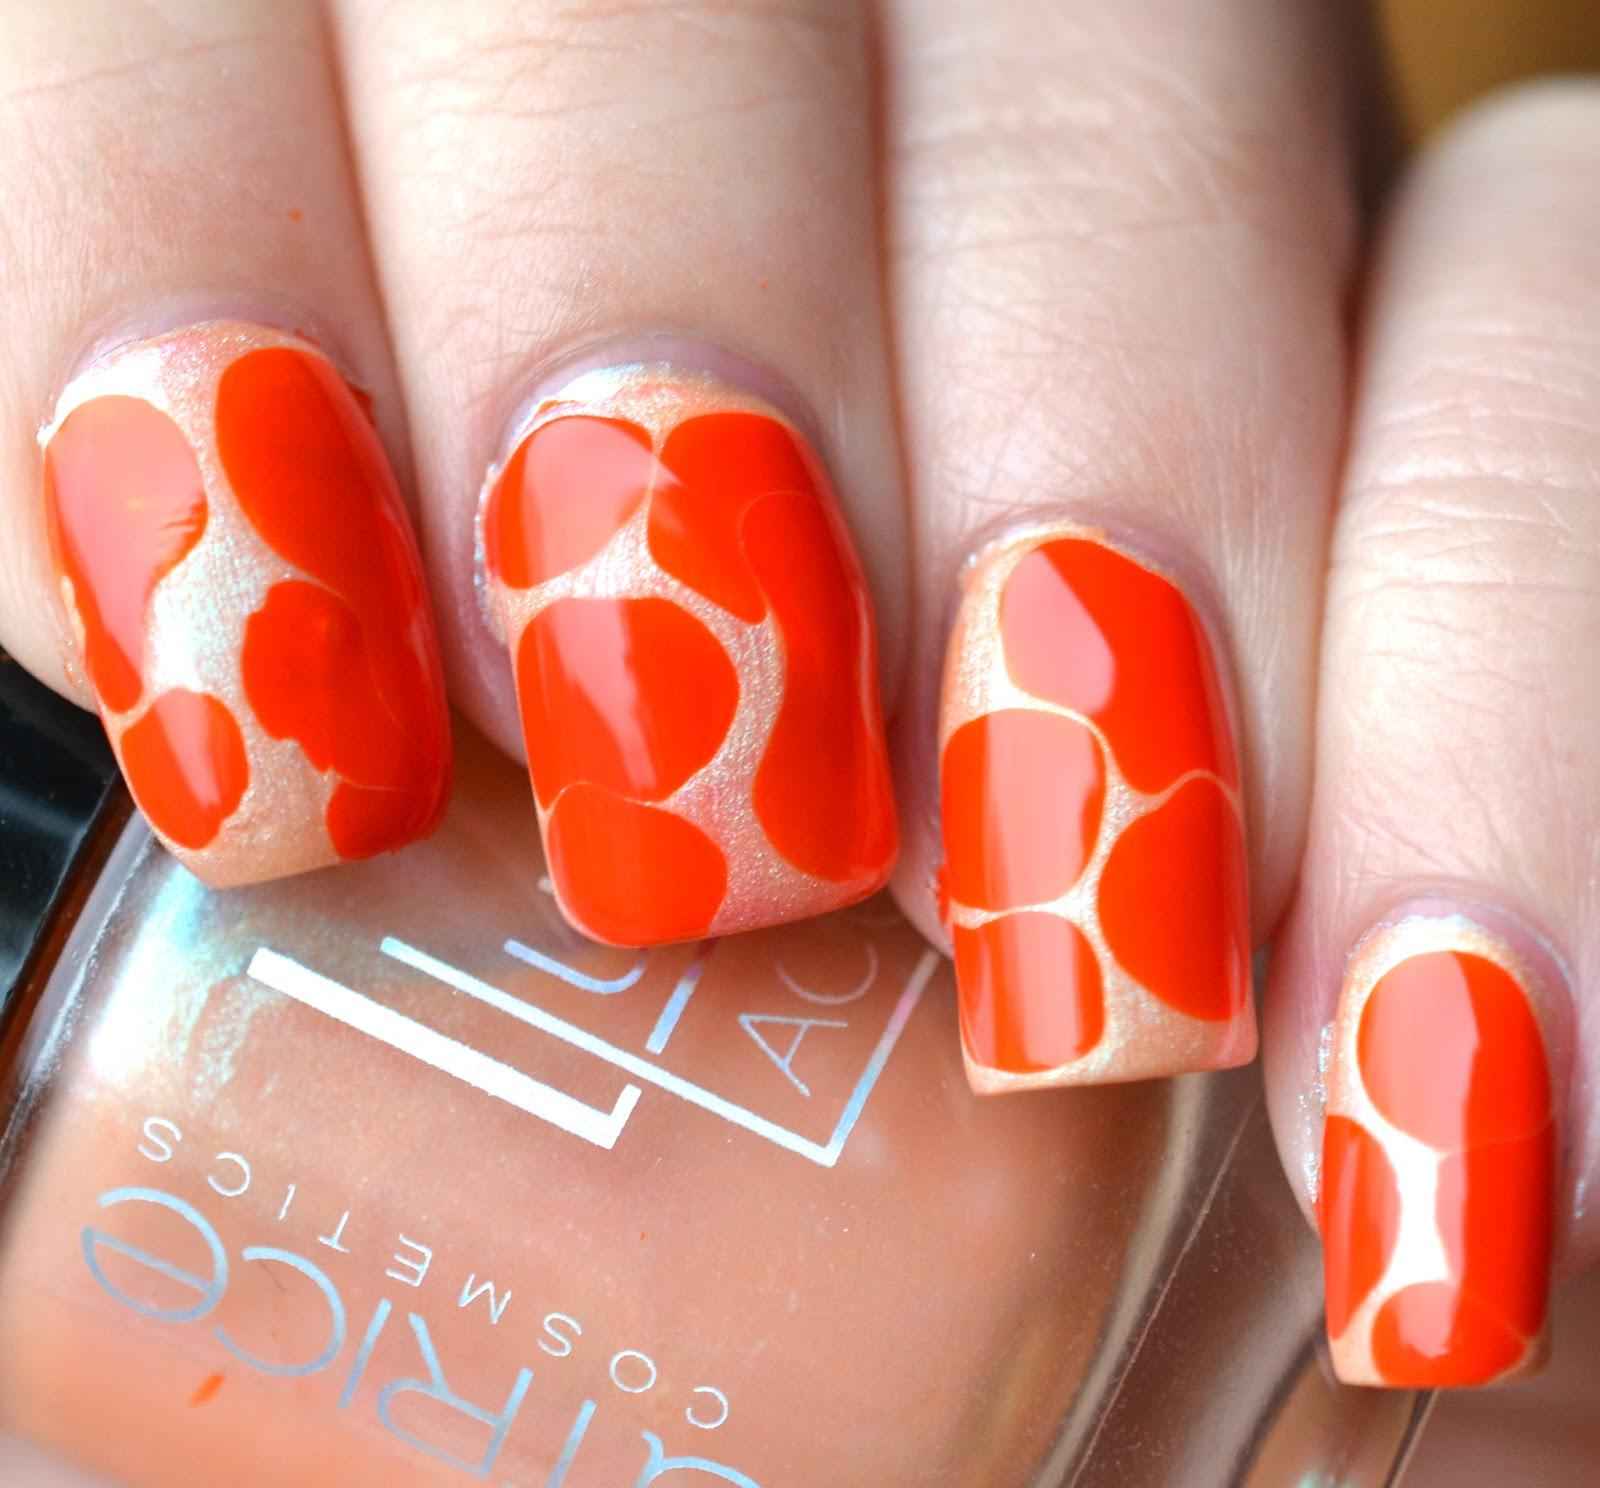 http://lenas-sofa.blogspot.de/2015/01/catrice-luxury-lacquers-chameleon-c08.html